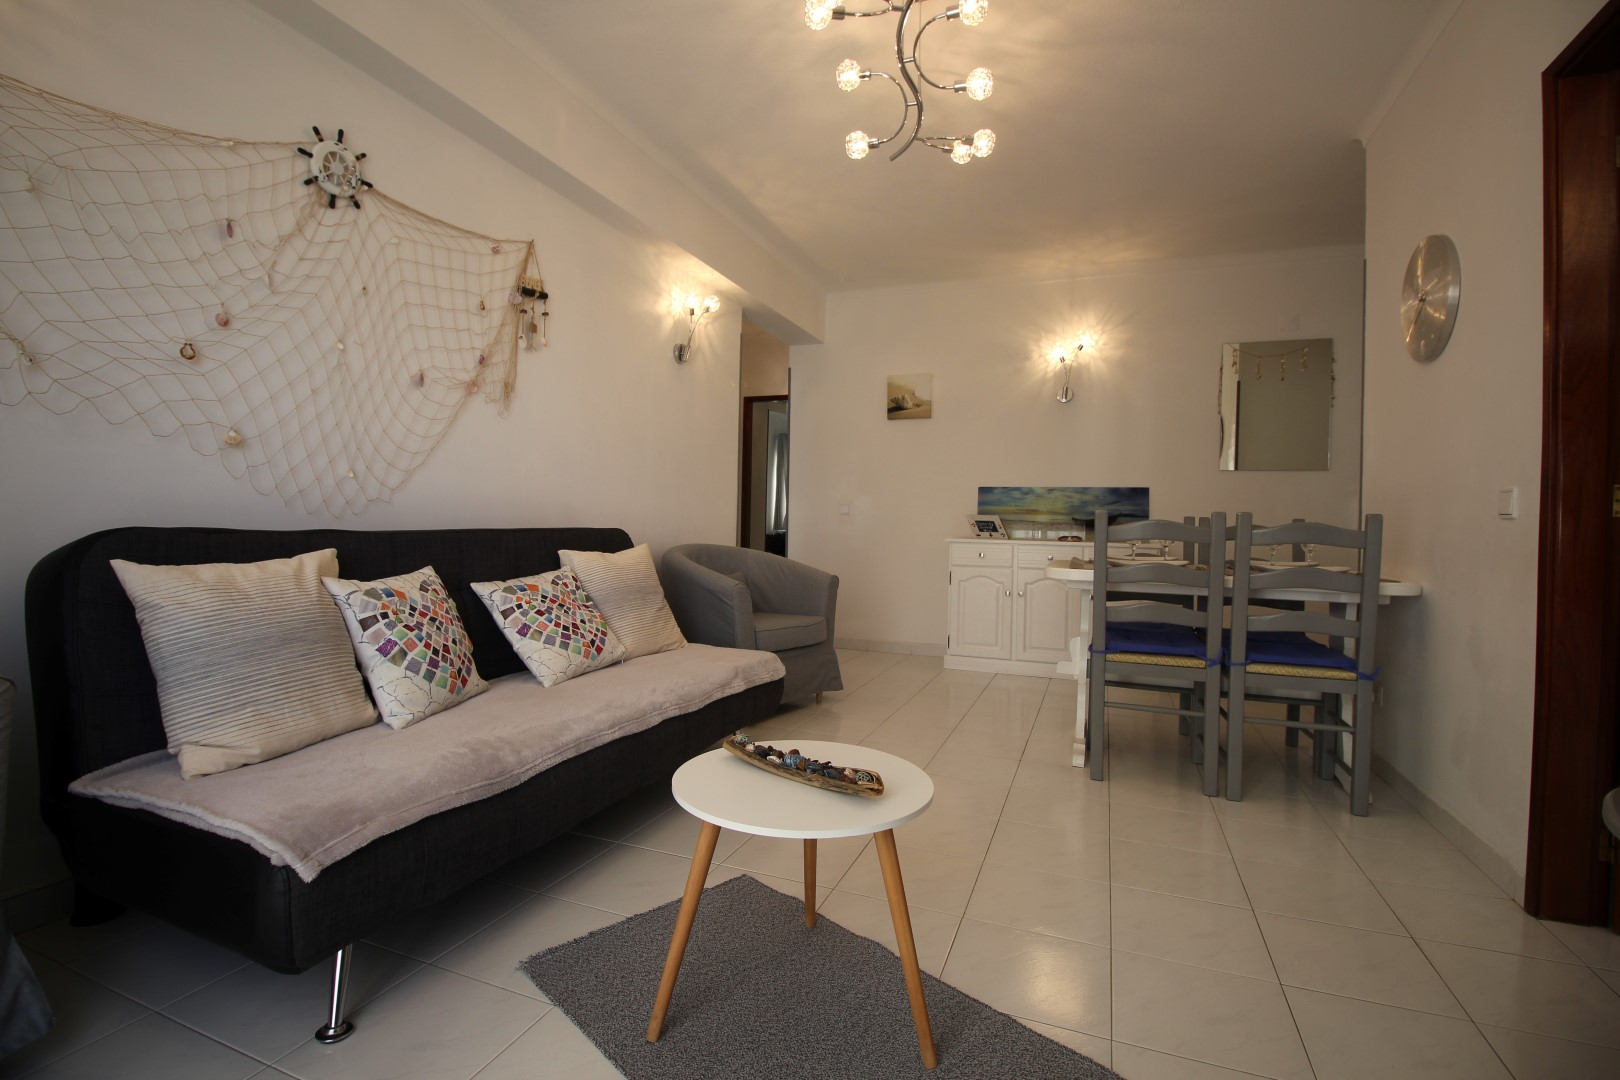 Location appartements et villas de vacance, Appartement en face de la plage – Armação-de-Pêra à Armação de Pêra, Portugal Algarve, REF_IMG_6809_8741